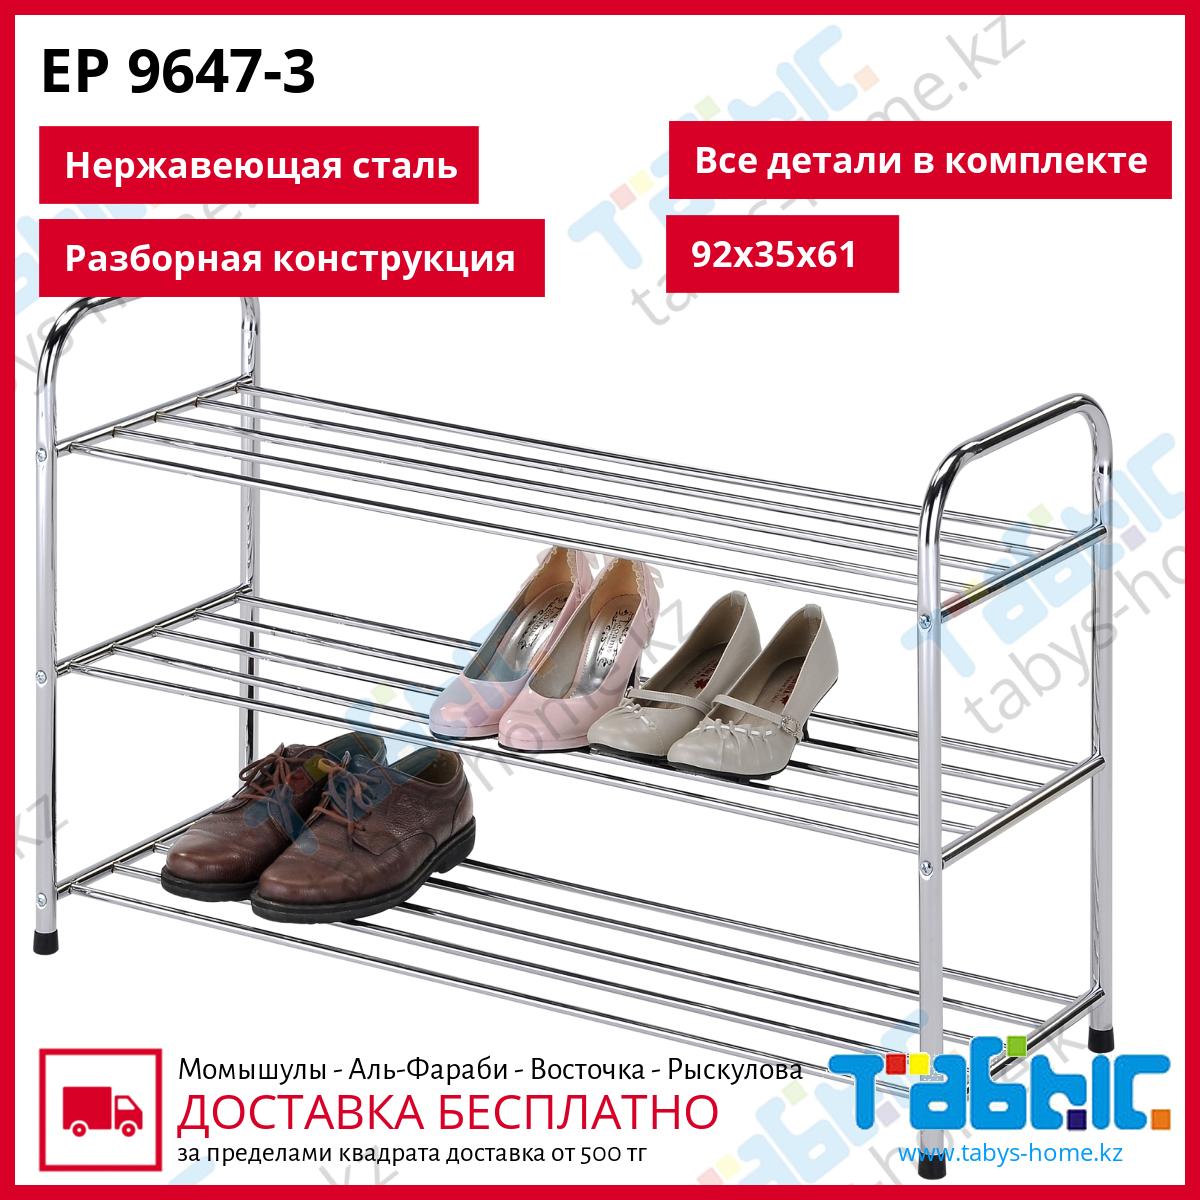 Обувница из 3-х полок Табыс EP-9647-3